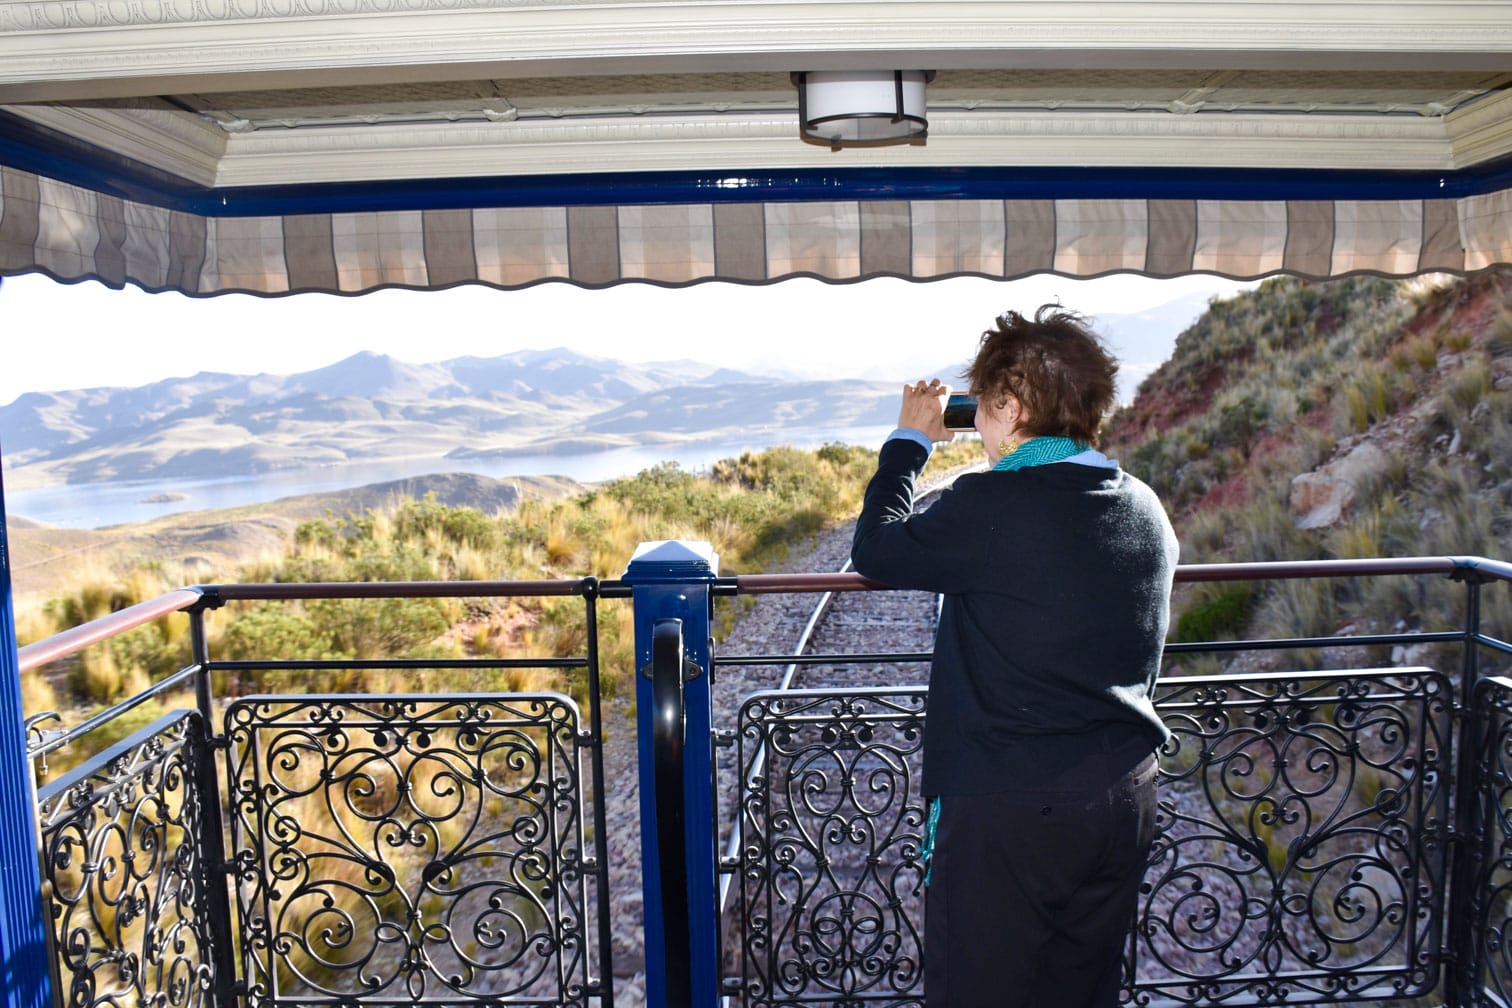 Woman using binoculars on the Belmond Andean Explorer train